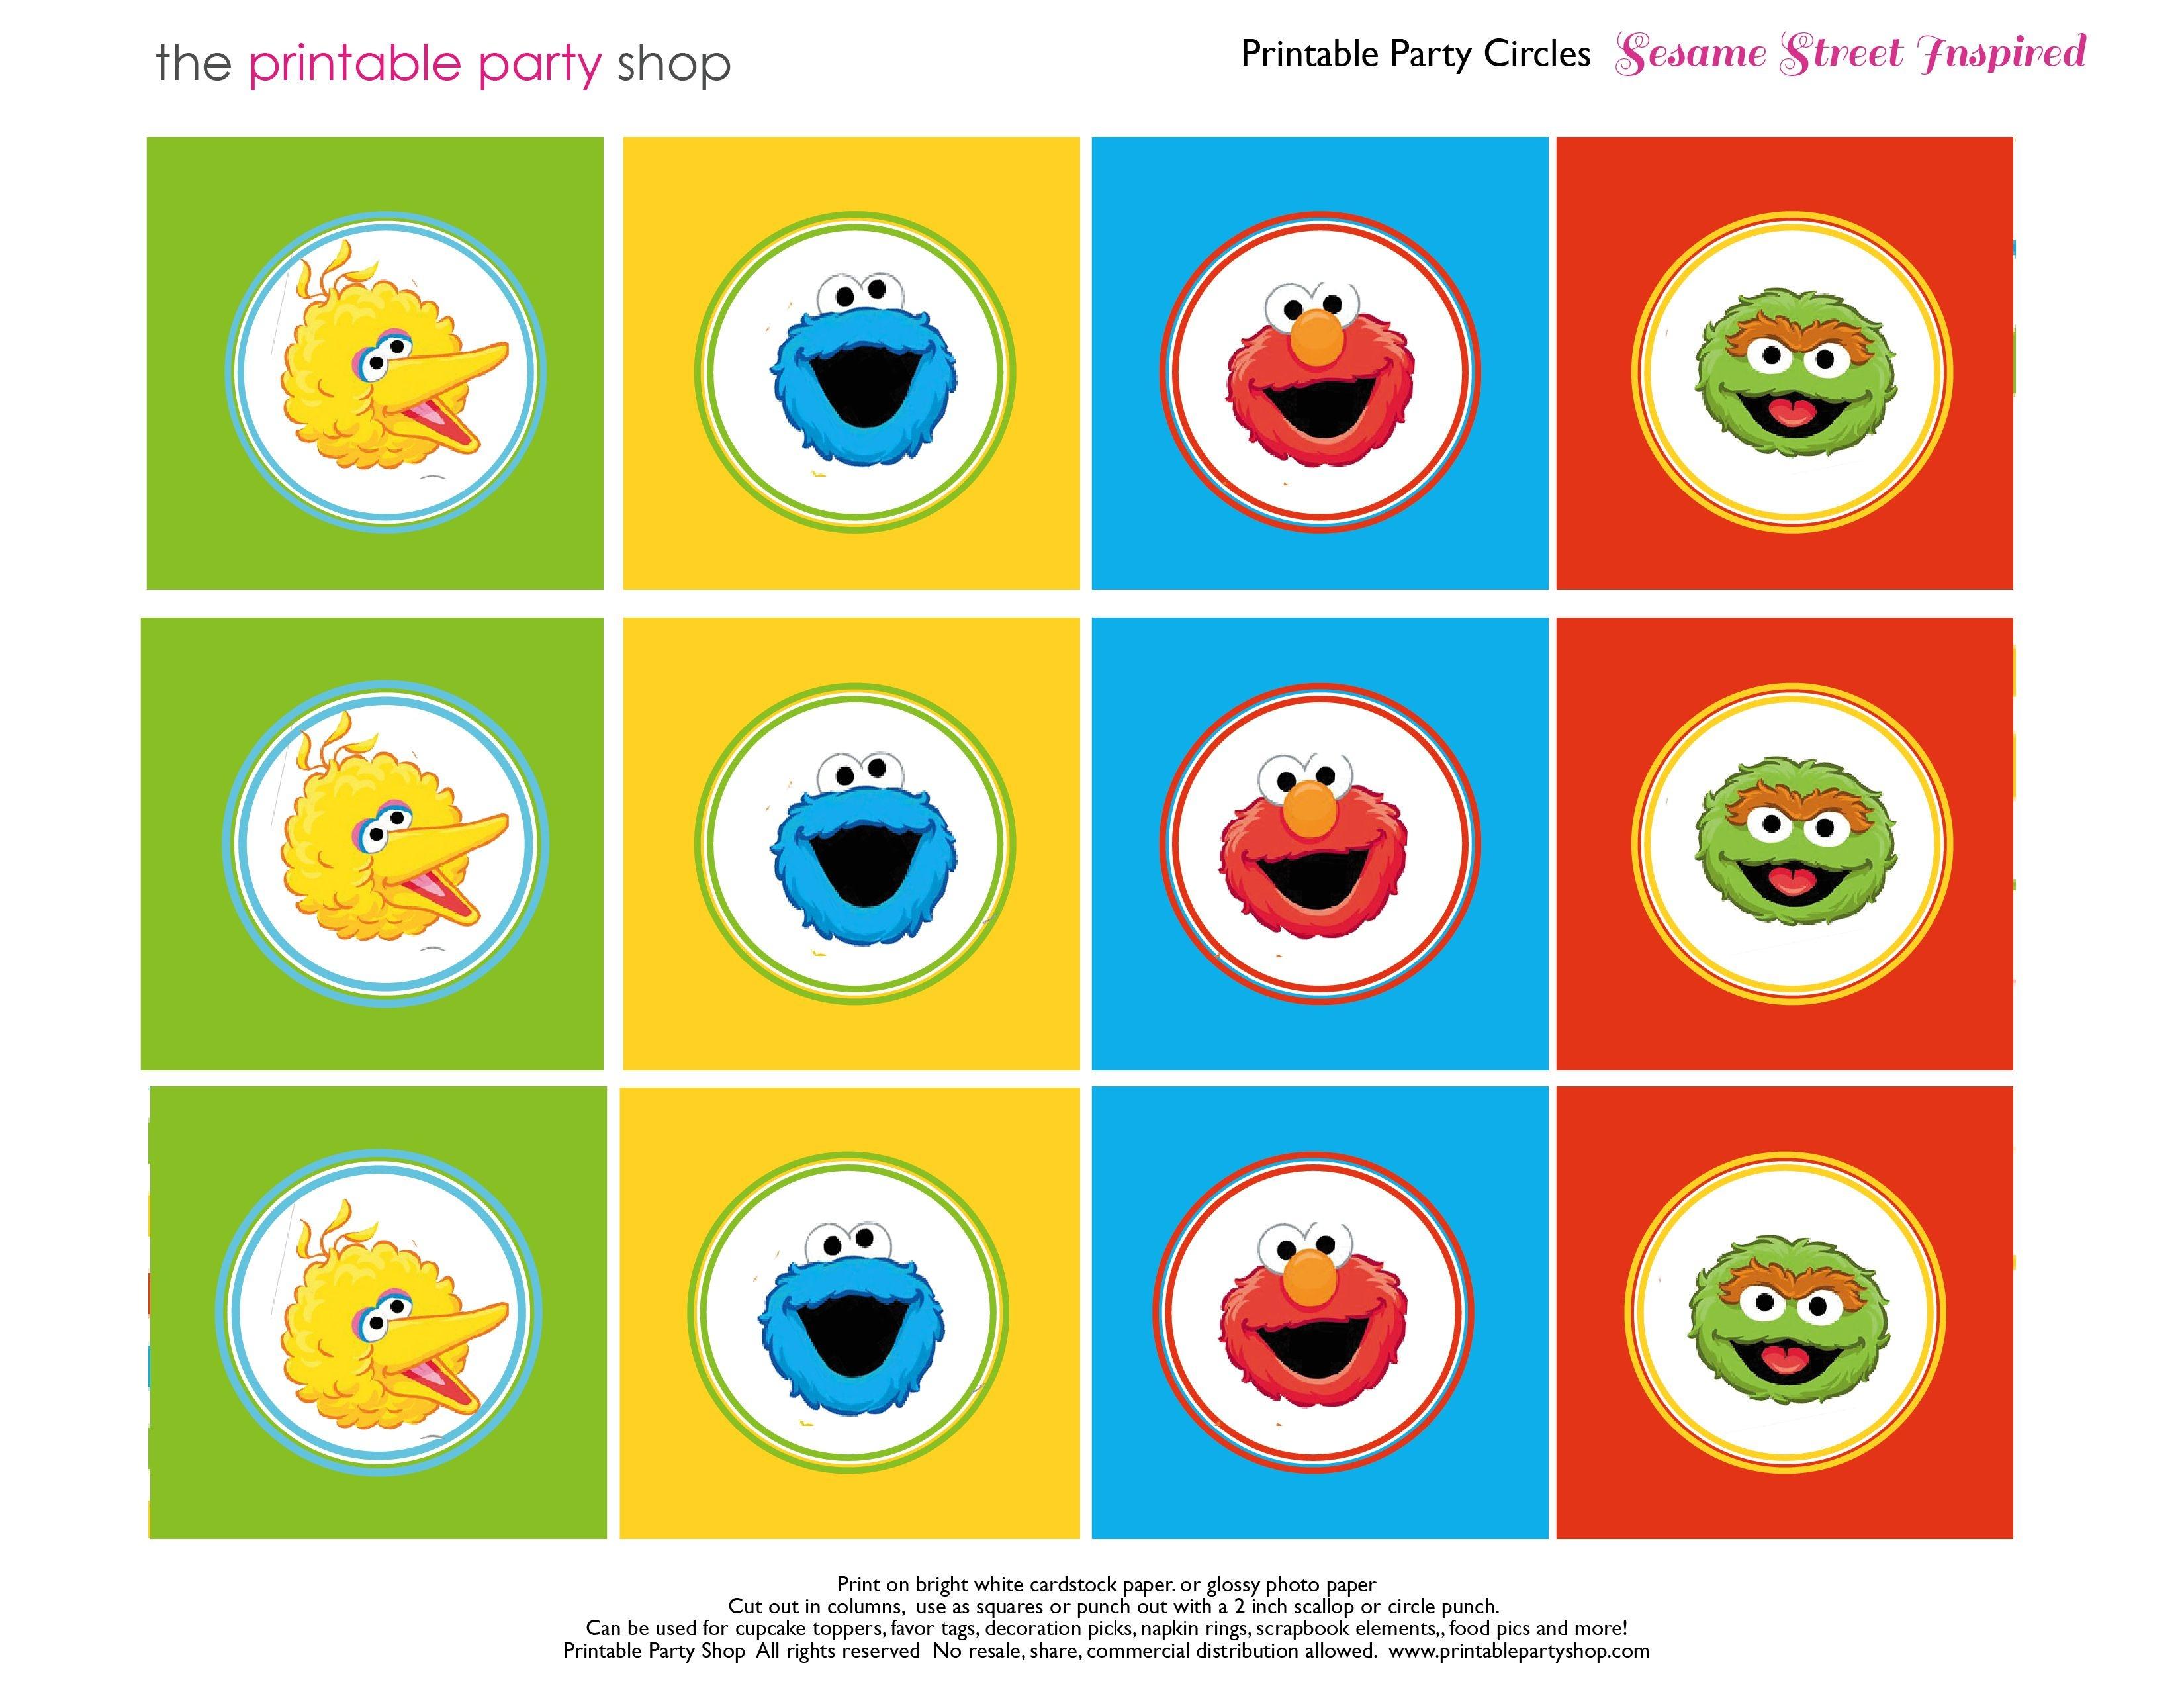 Free Sesame Street Printables   Party-Circles-Characters-Colorblocks - Free Printable Party Circles